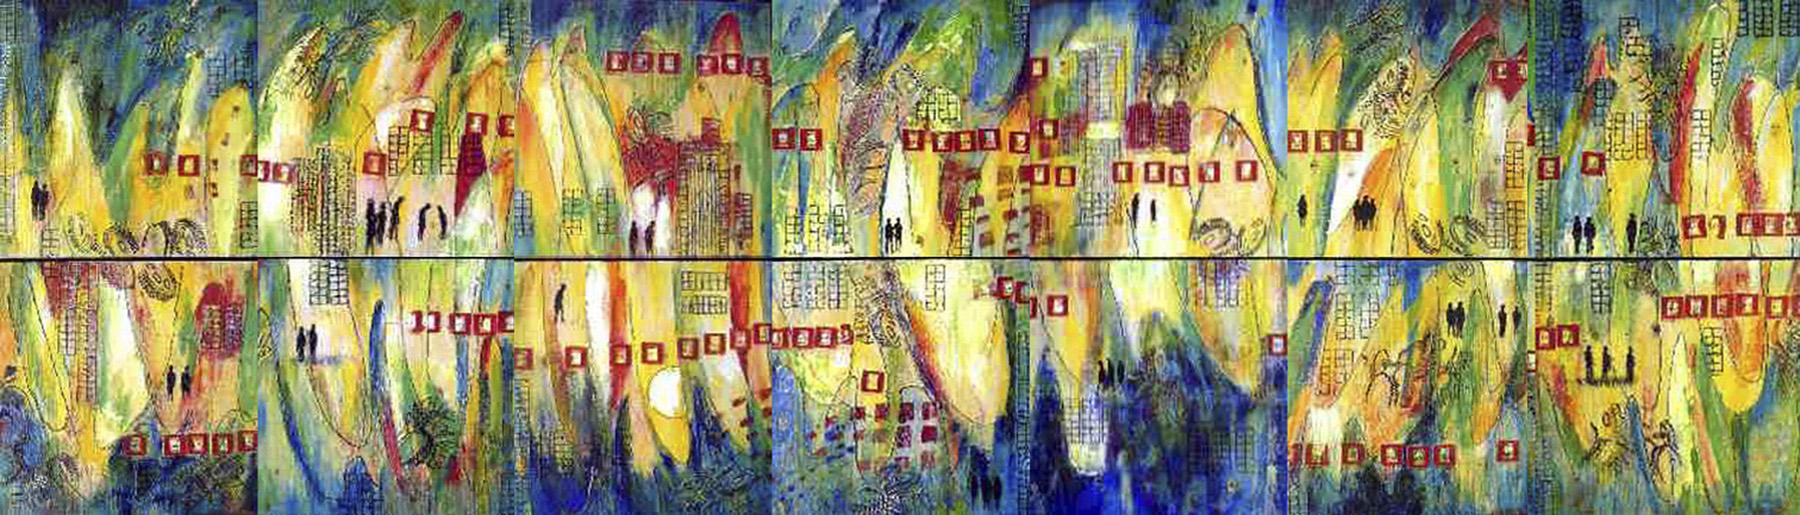 Gisele Normandin - Urbanité riveraine